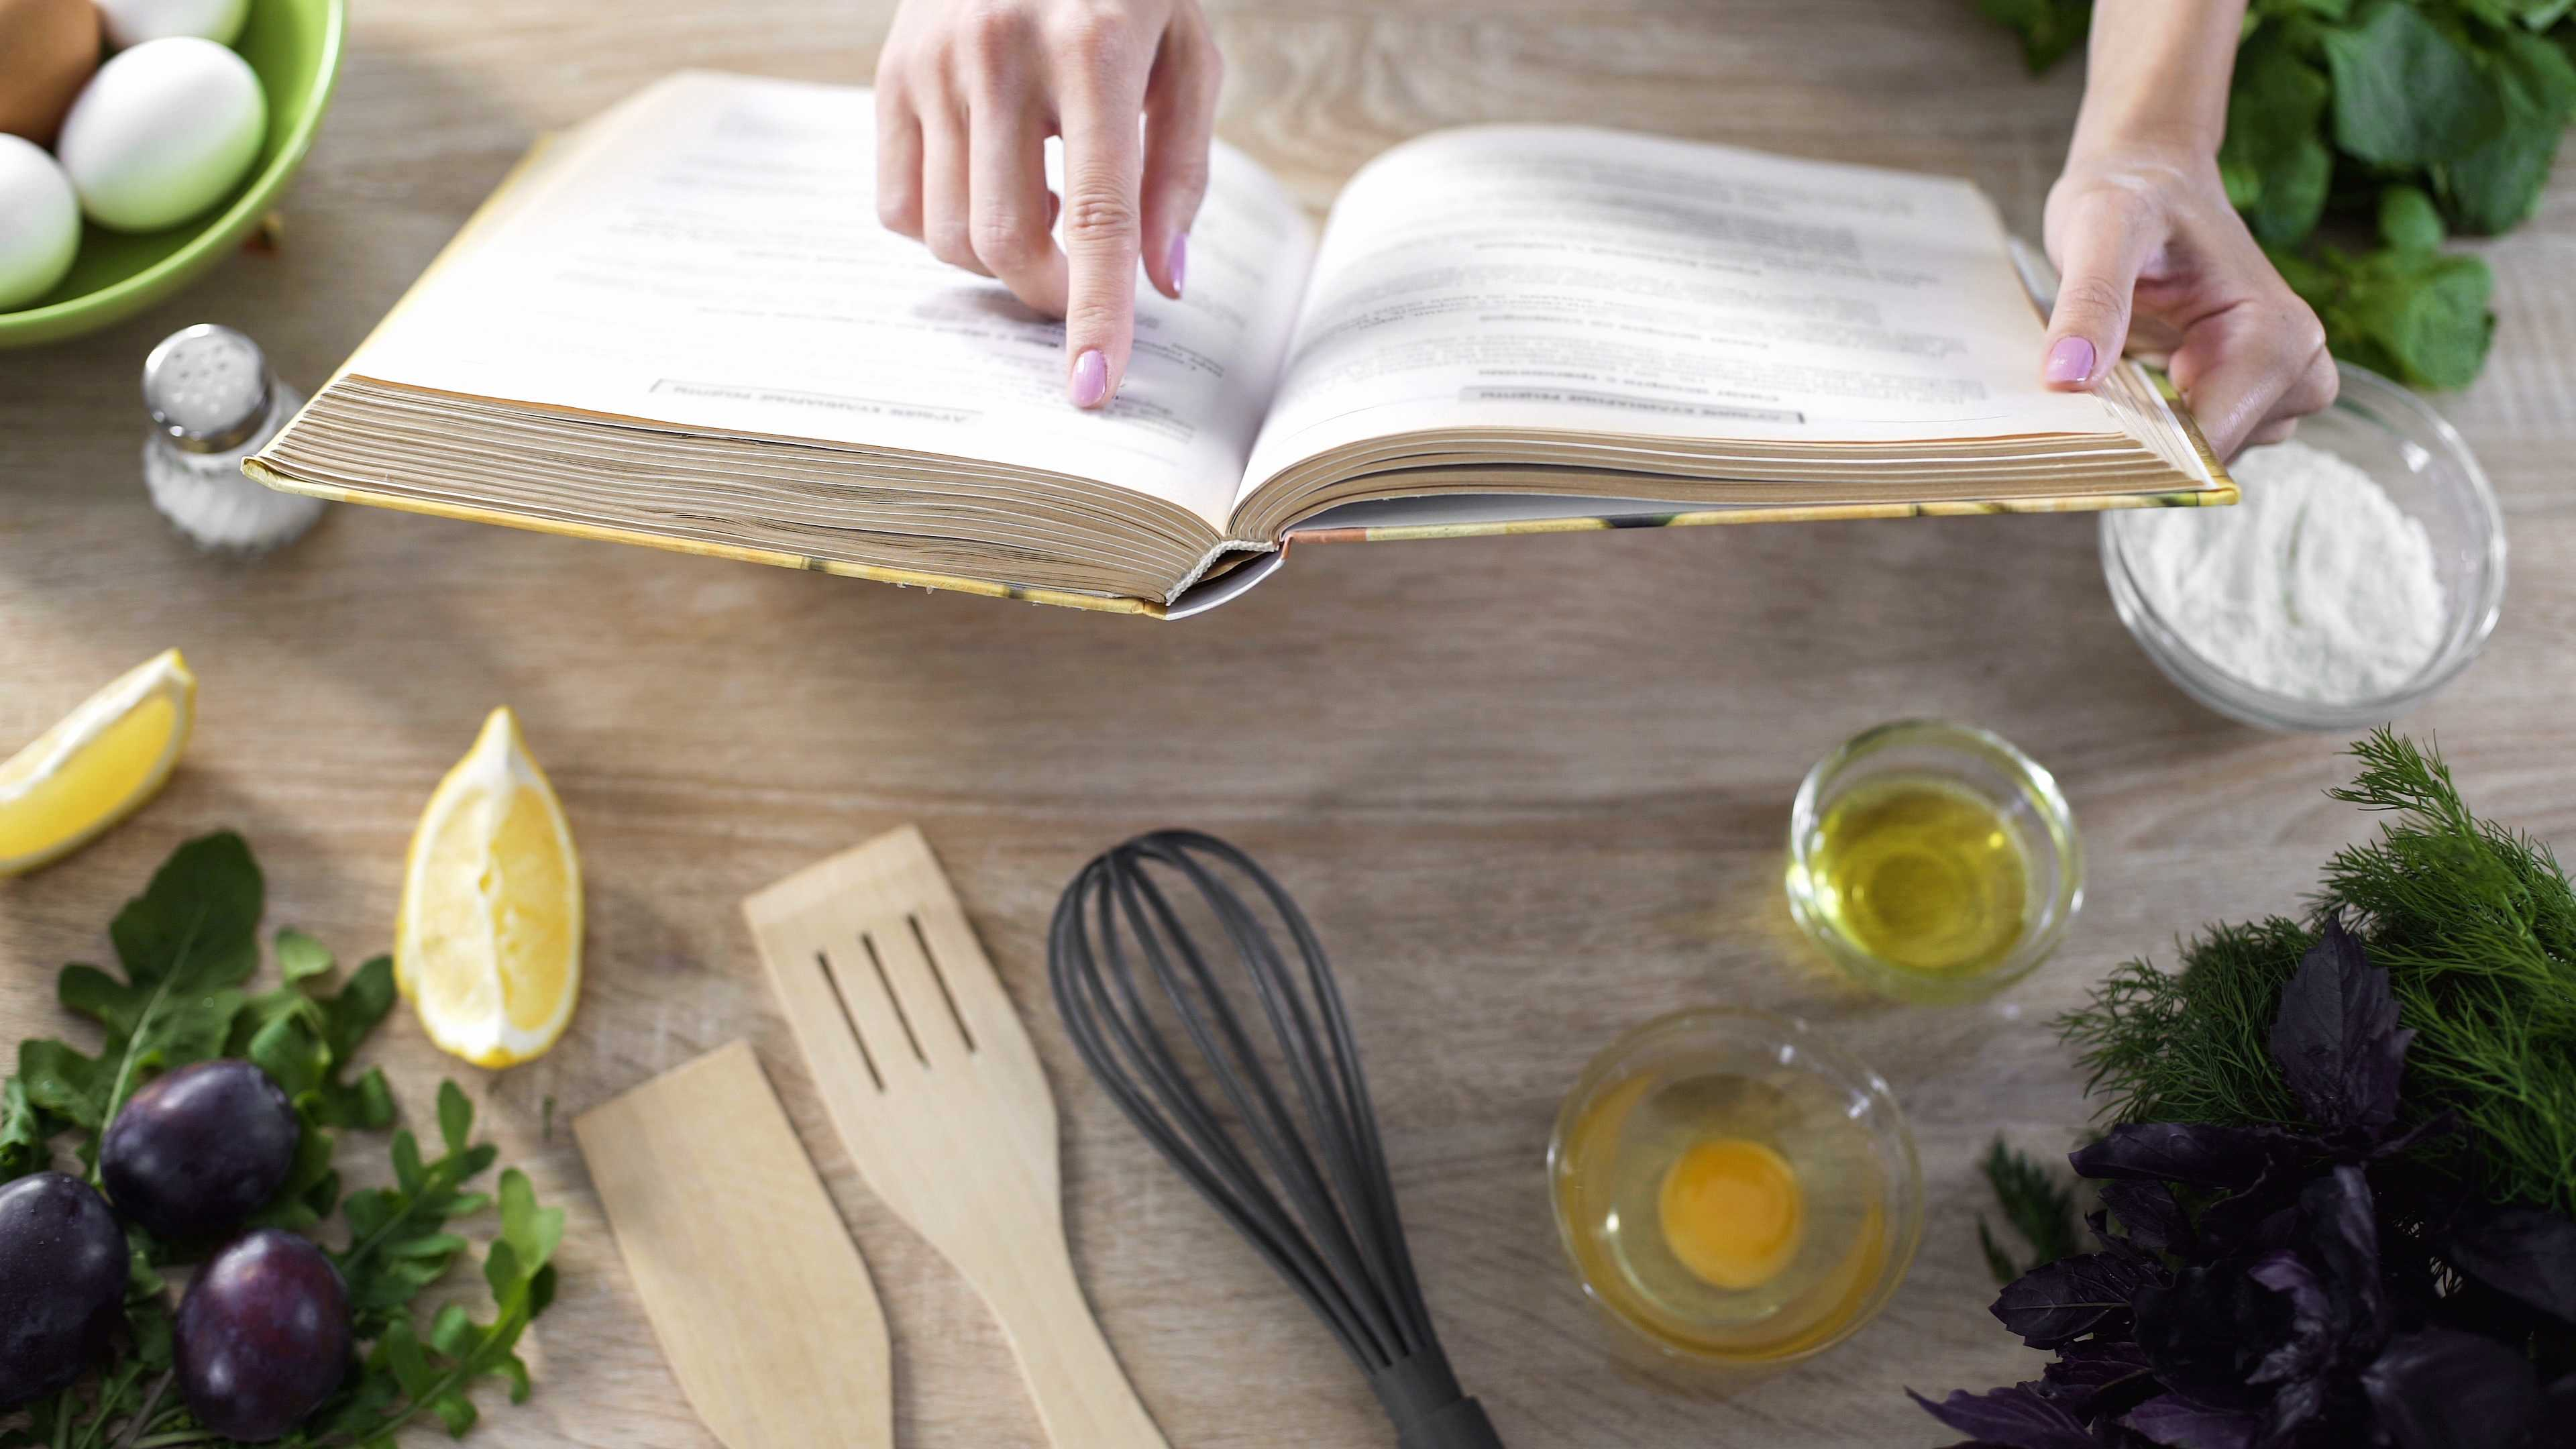 Free Diabetes Cookbooks